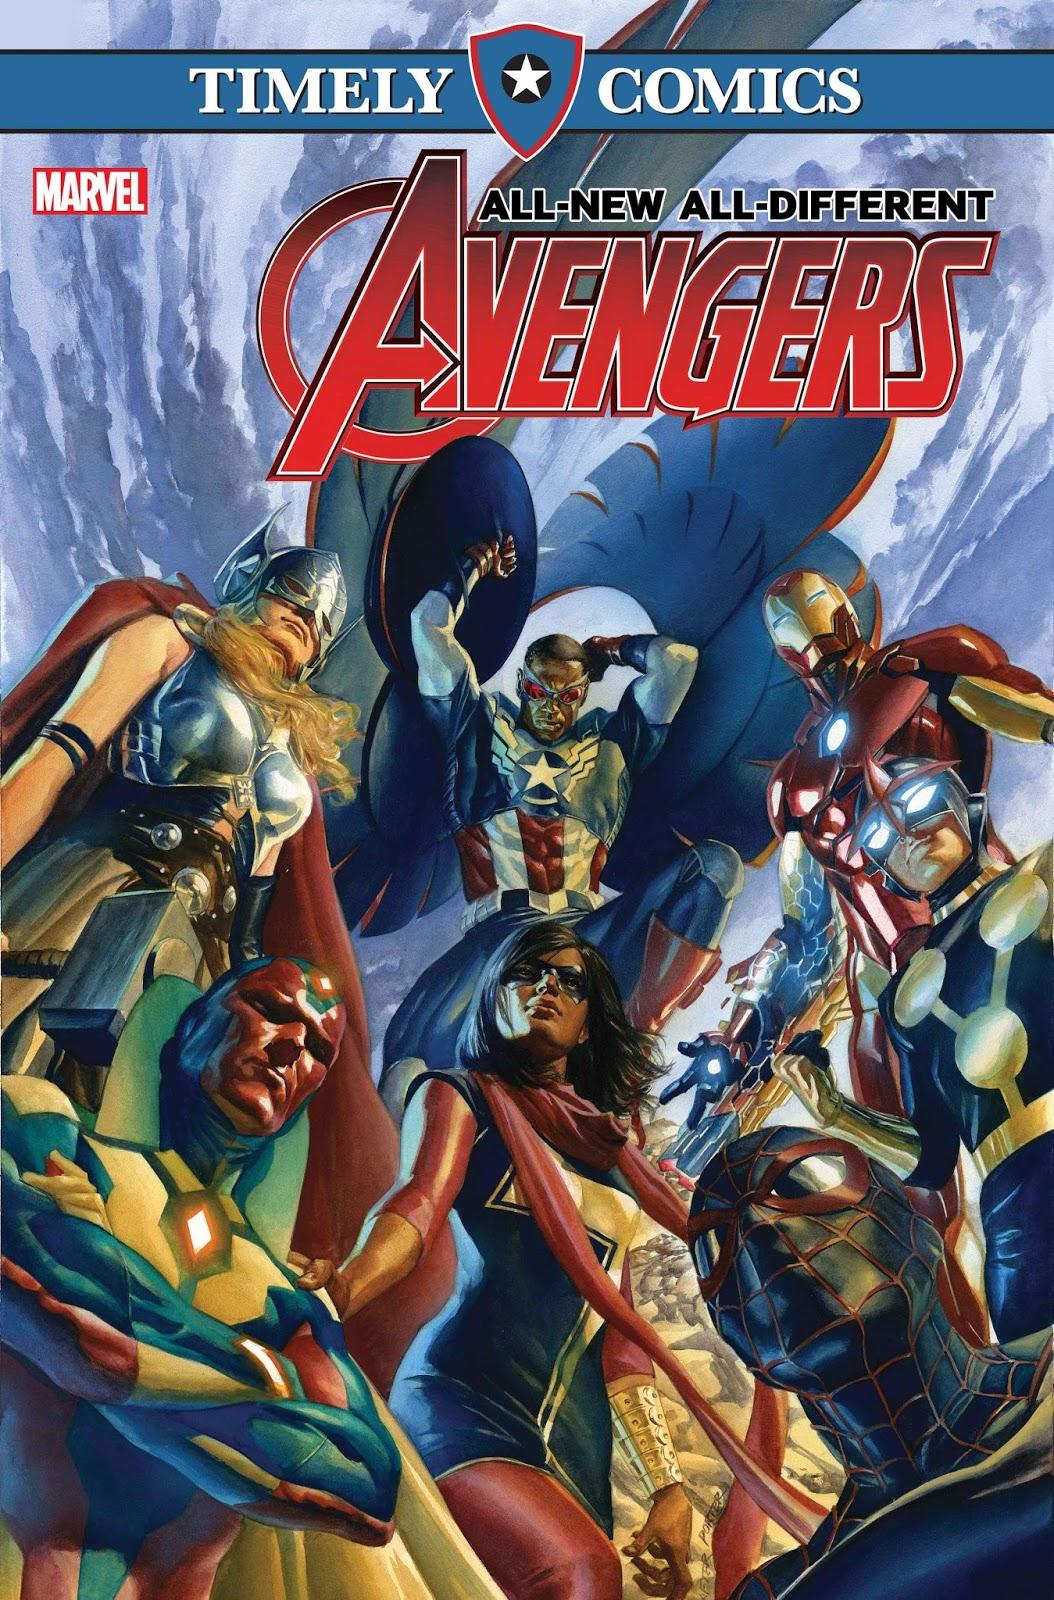 Timely Comics: Web Warriors #1